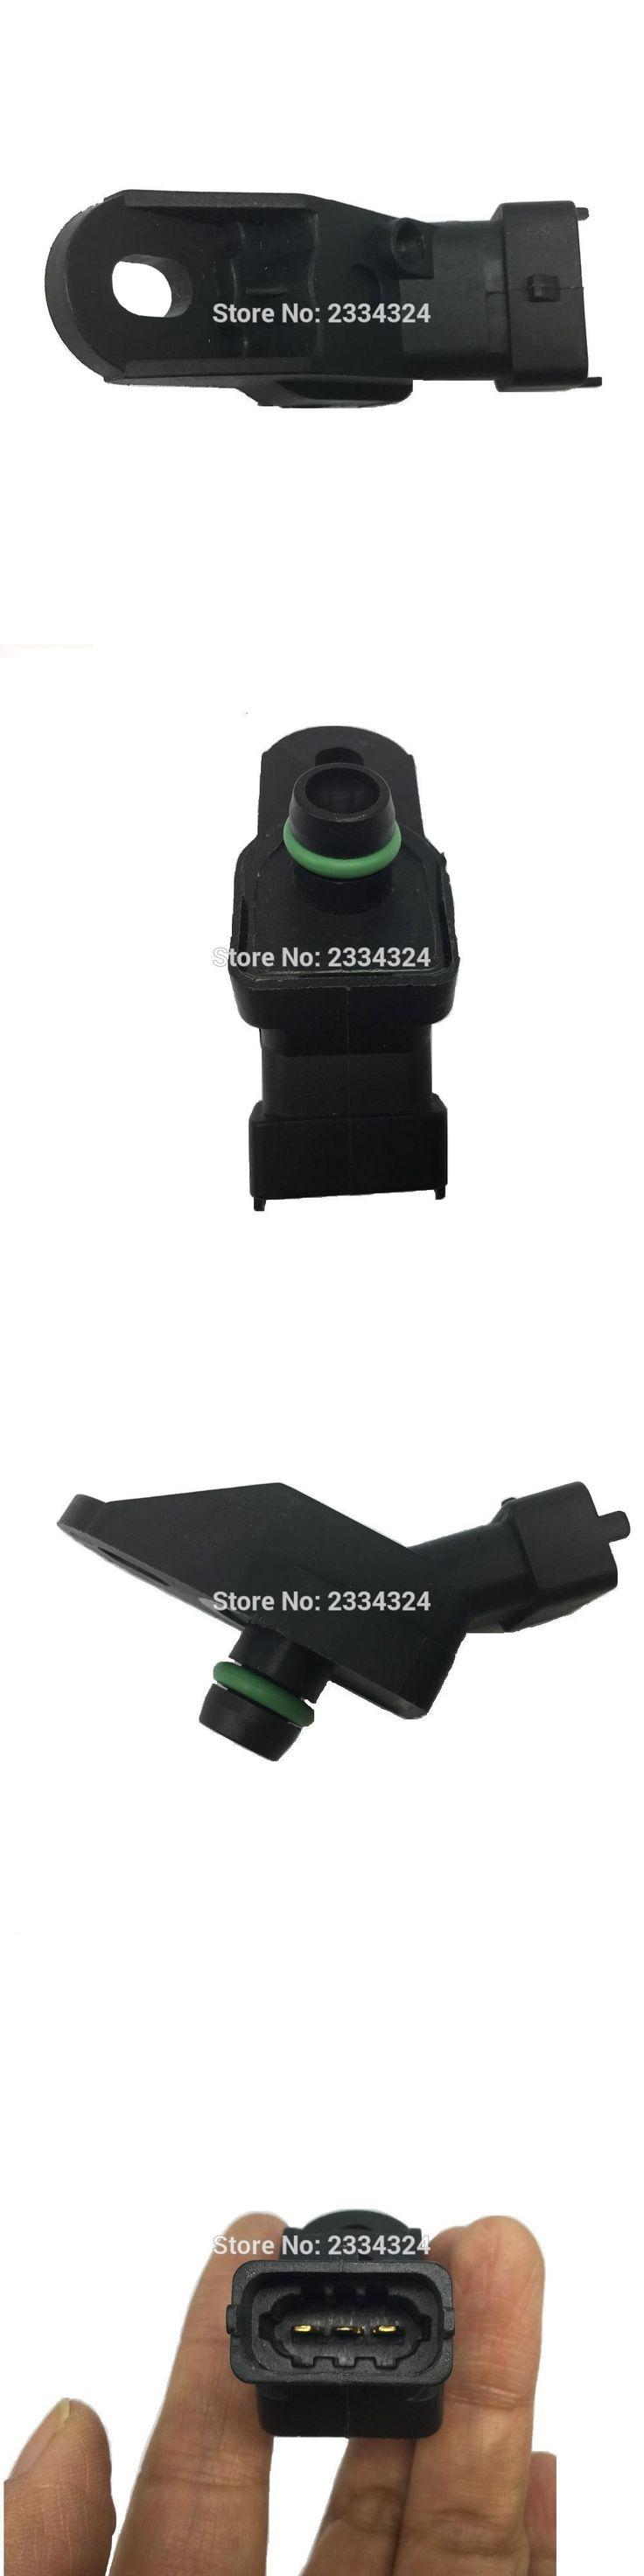 Intake Air Pressure Sensor For BMW E39 E46 E53 330D/XD 525 530 X5 Range Rover Opel Vauxhall Omega B 2.5 DTi/3.0 TD 0261230046